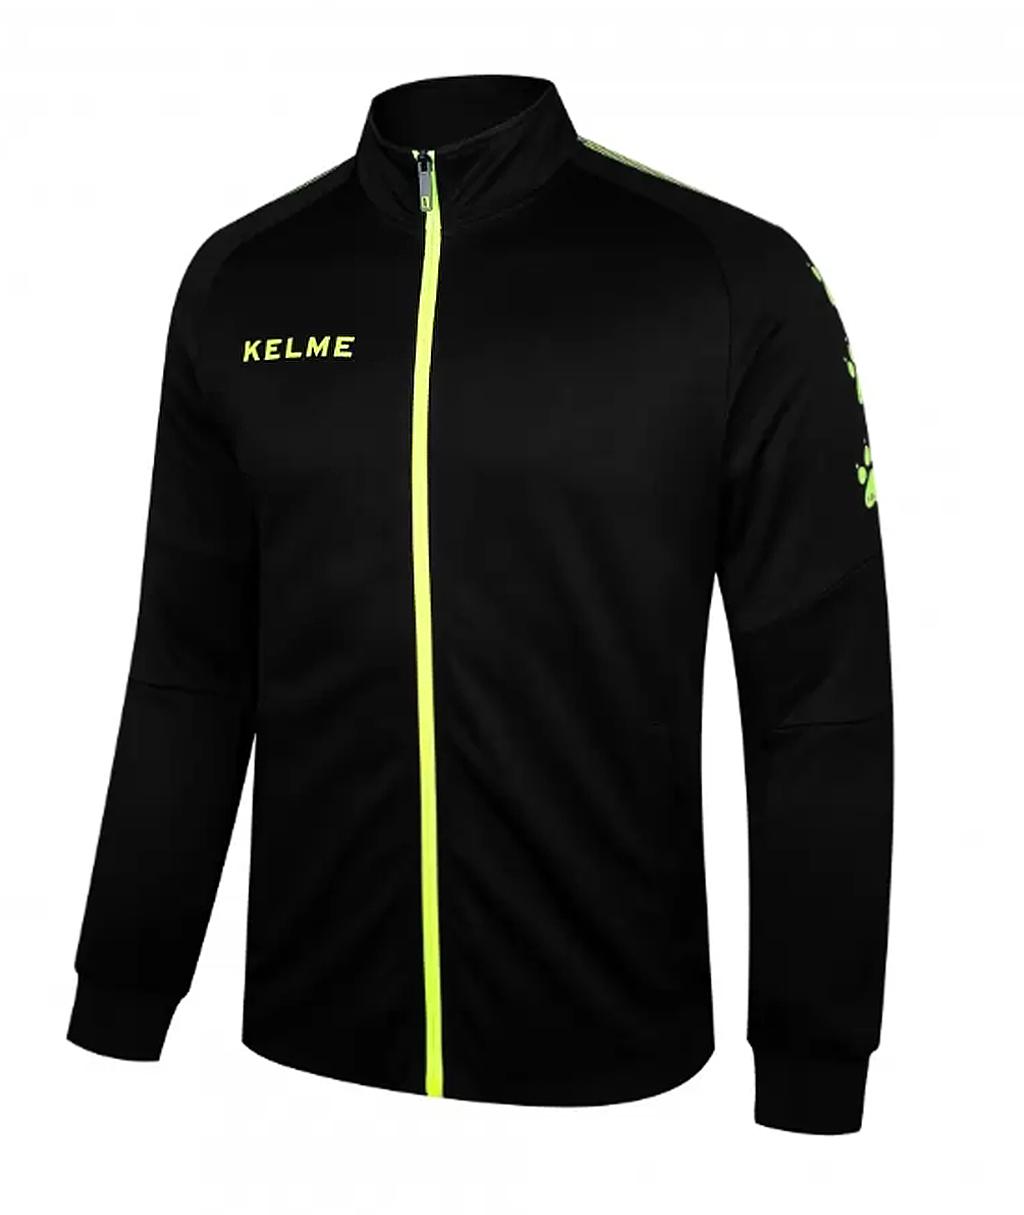 Купить чёрную олимпийку Kelme Training Jacked 3881324-012 в интернет-магазине